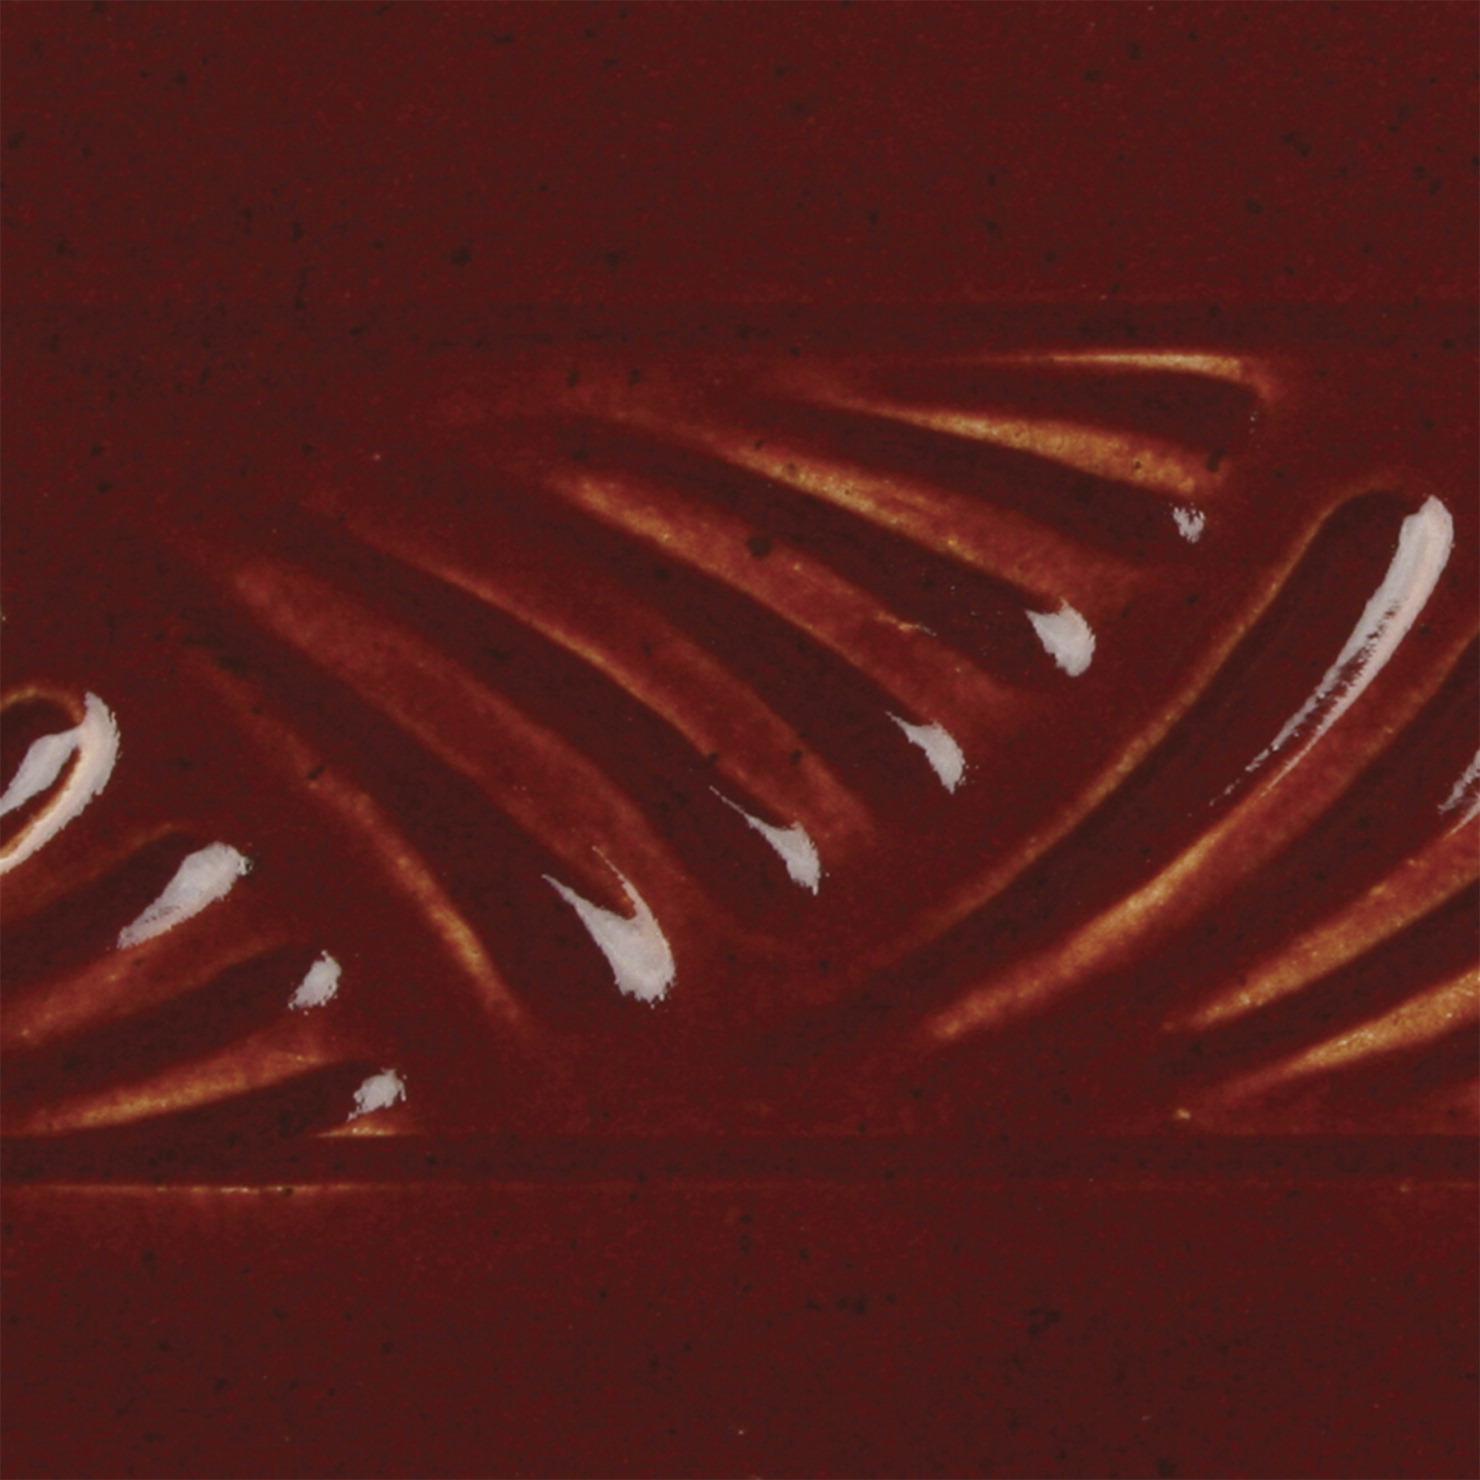 AMACO Potters Choice Lead-Free Non-Toxic Glaze, 1 pt, Deep Firebrick PC-59